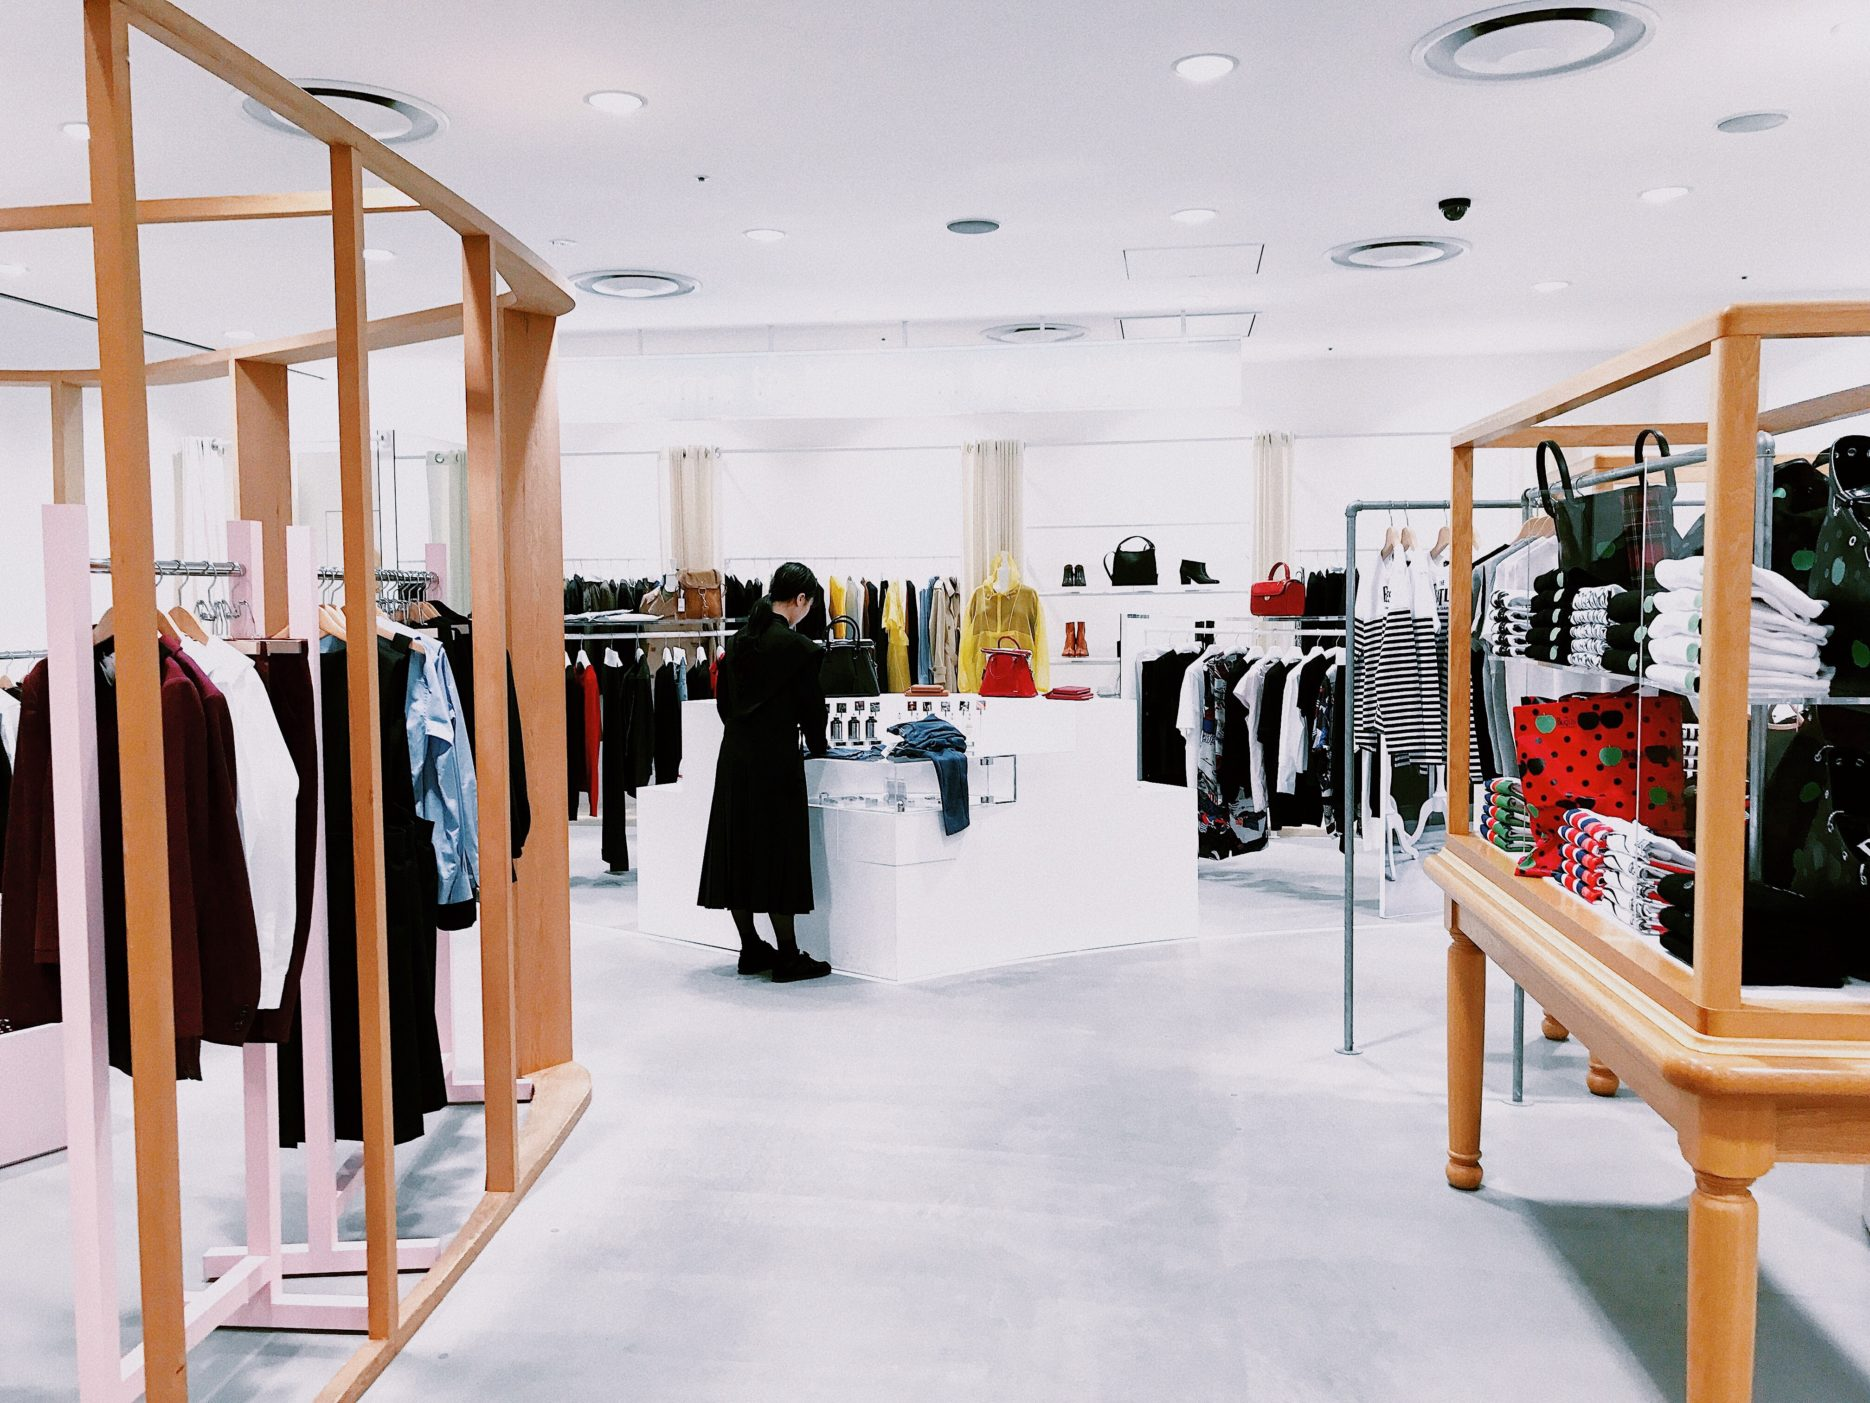 Retail in China. Credit: Unsplash